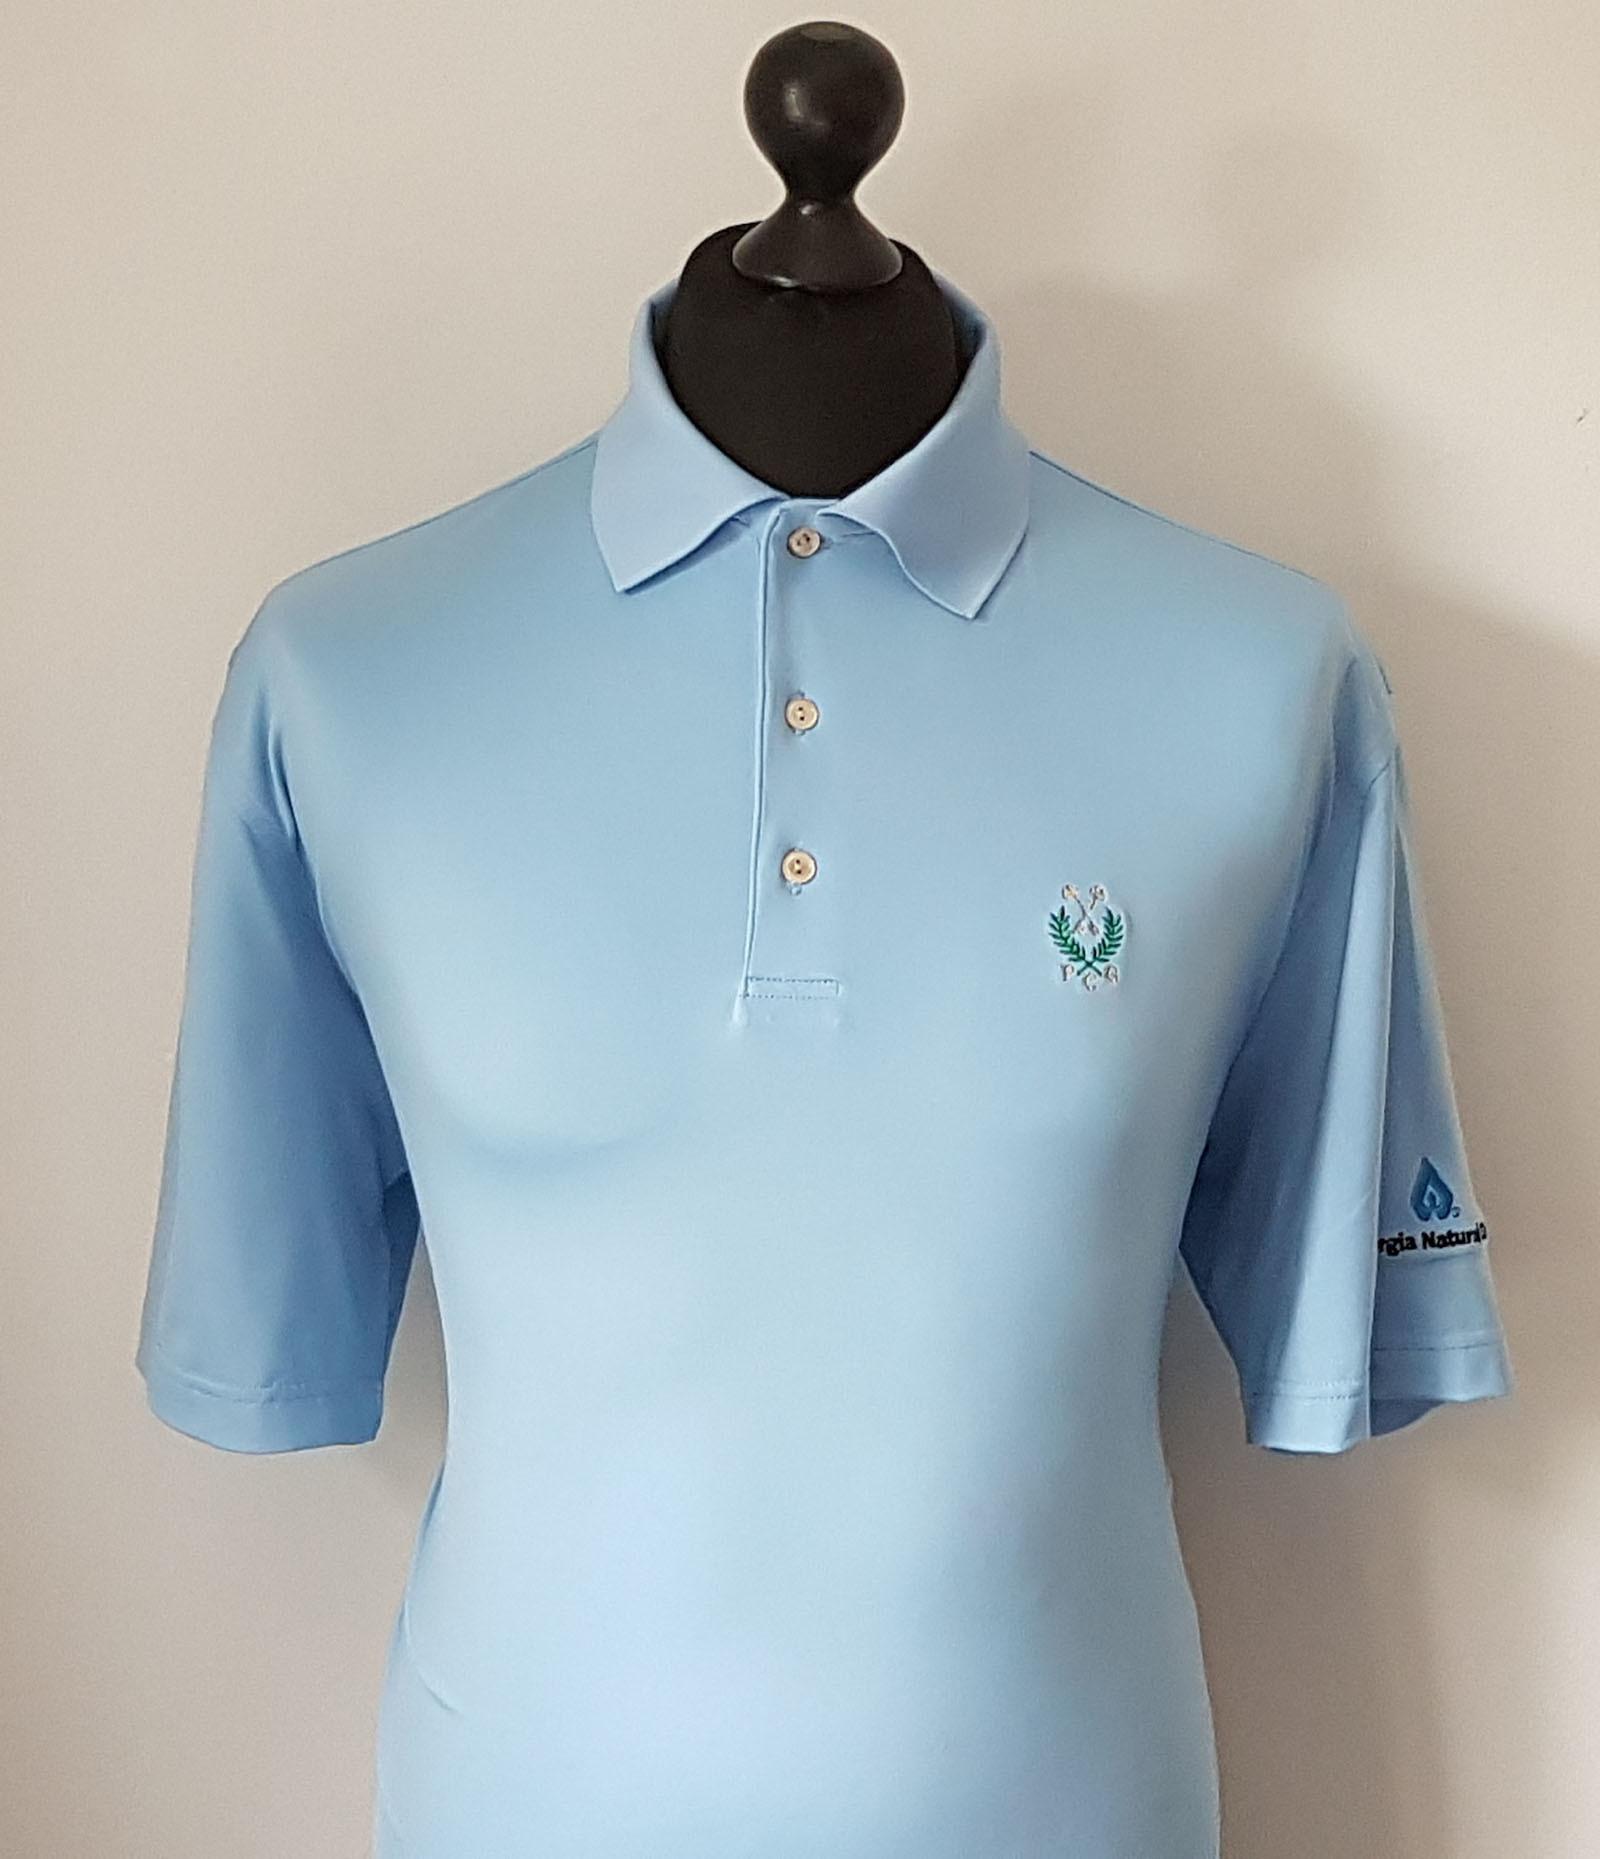 Peter millar summer comfort men 39 s vibrant blue golf polo for Peter millar golf shirts